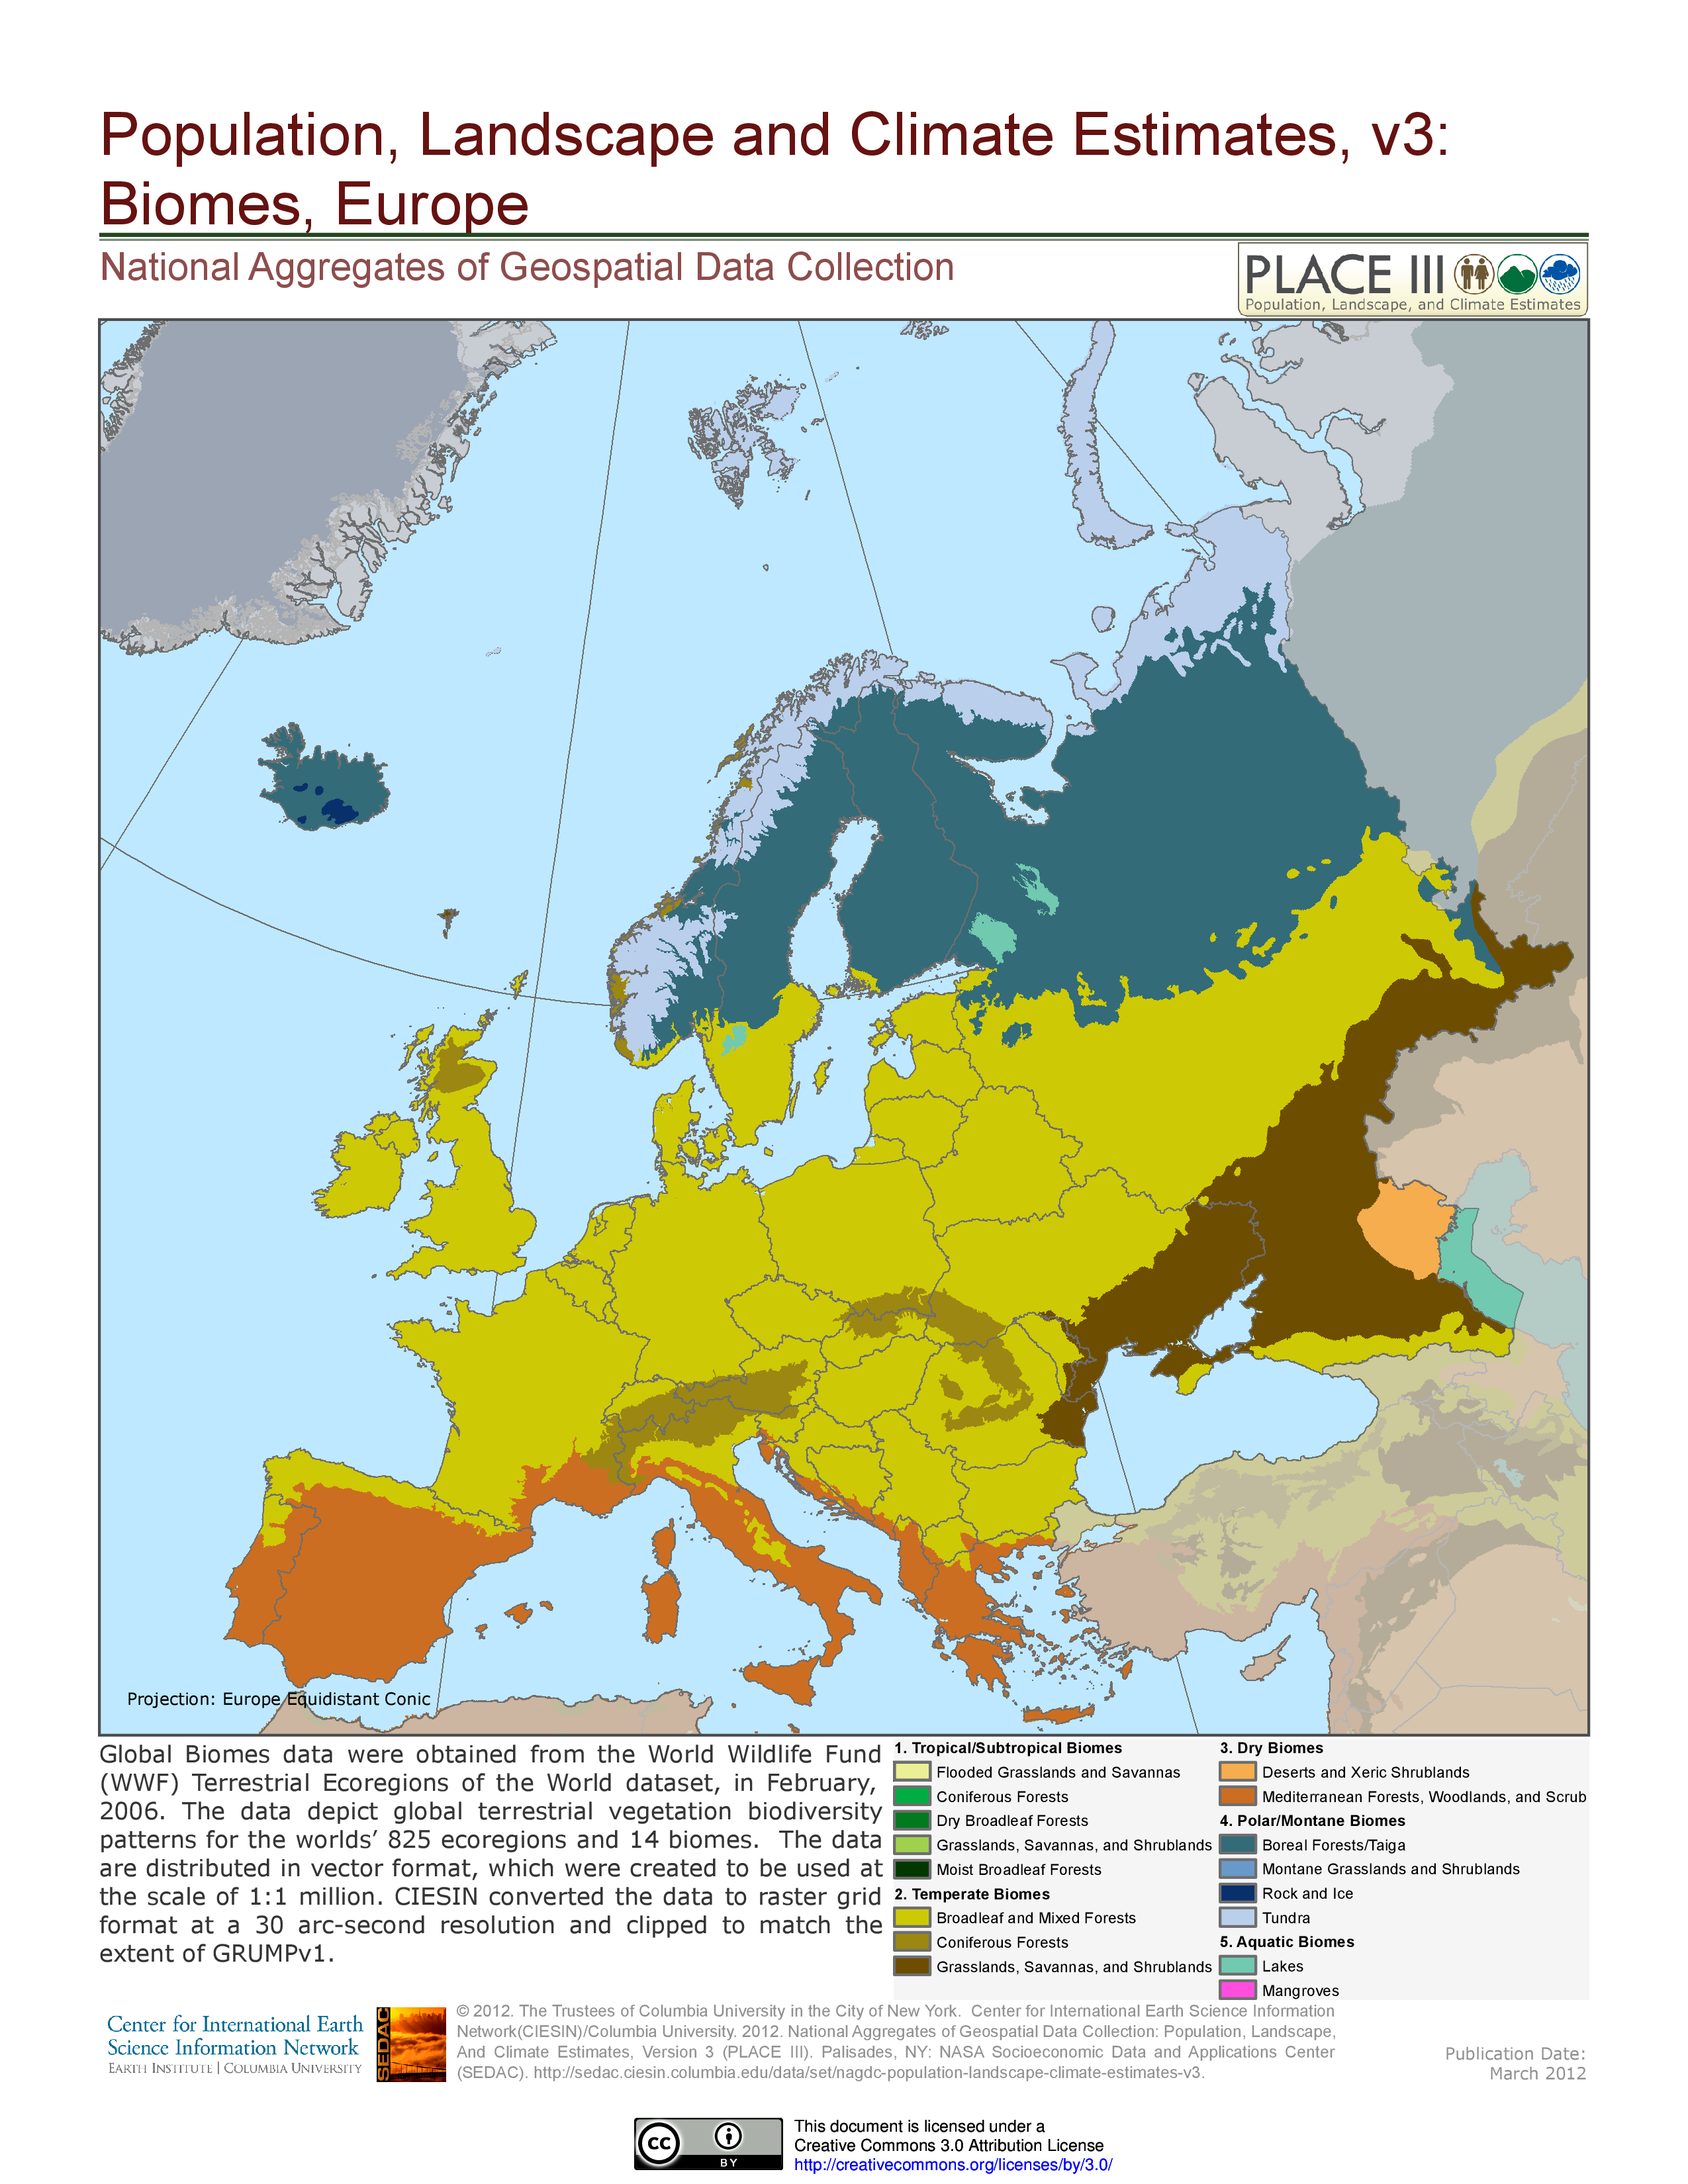 Biomes Of Europe